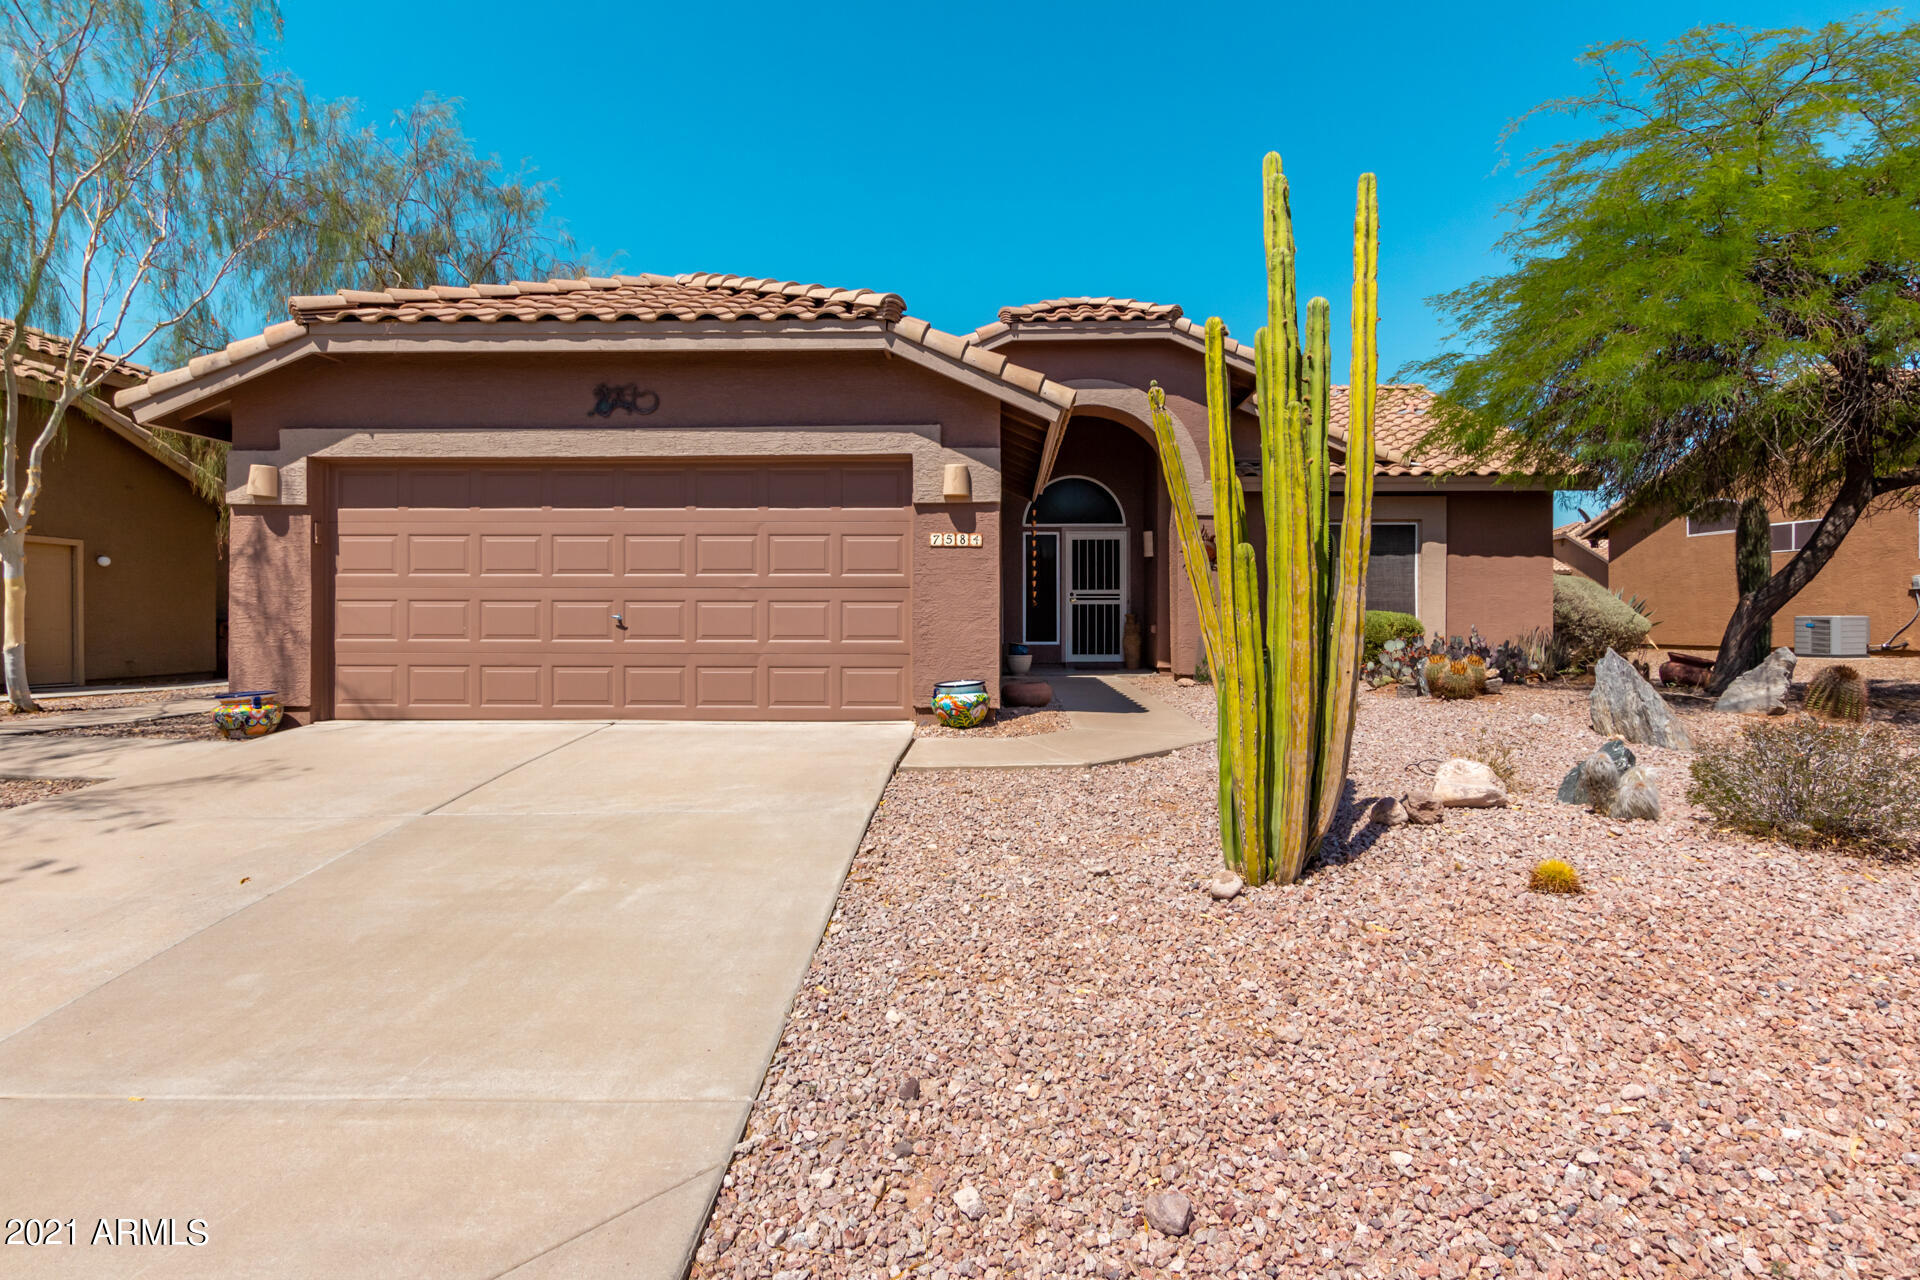 7584 E RUGGED IRONWOOD Road, Gold Canyon, AZ 85118, 2 Bedrooms Bedrooms, ,Residential,For Sale,7584 E RUGGED IRONWOOD Road,6262849